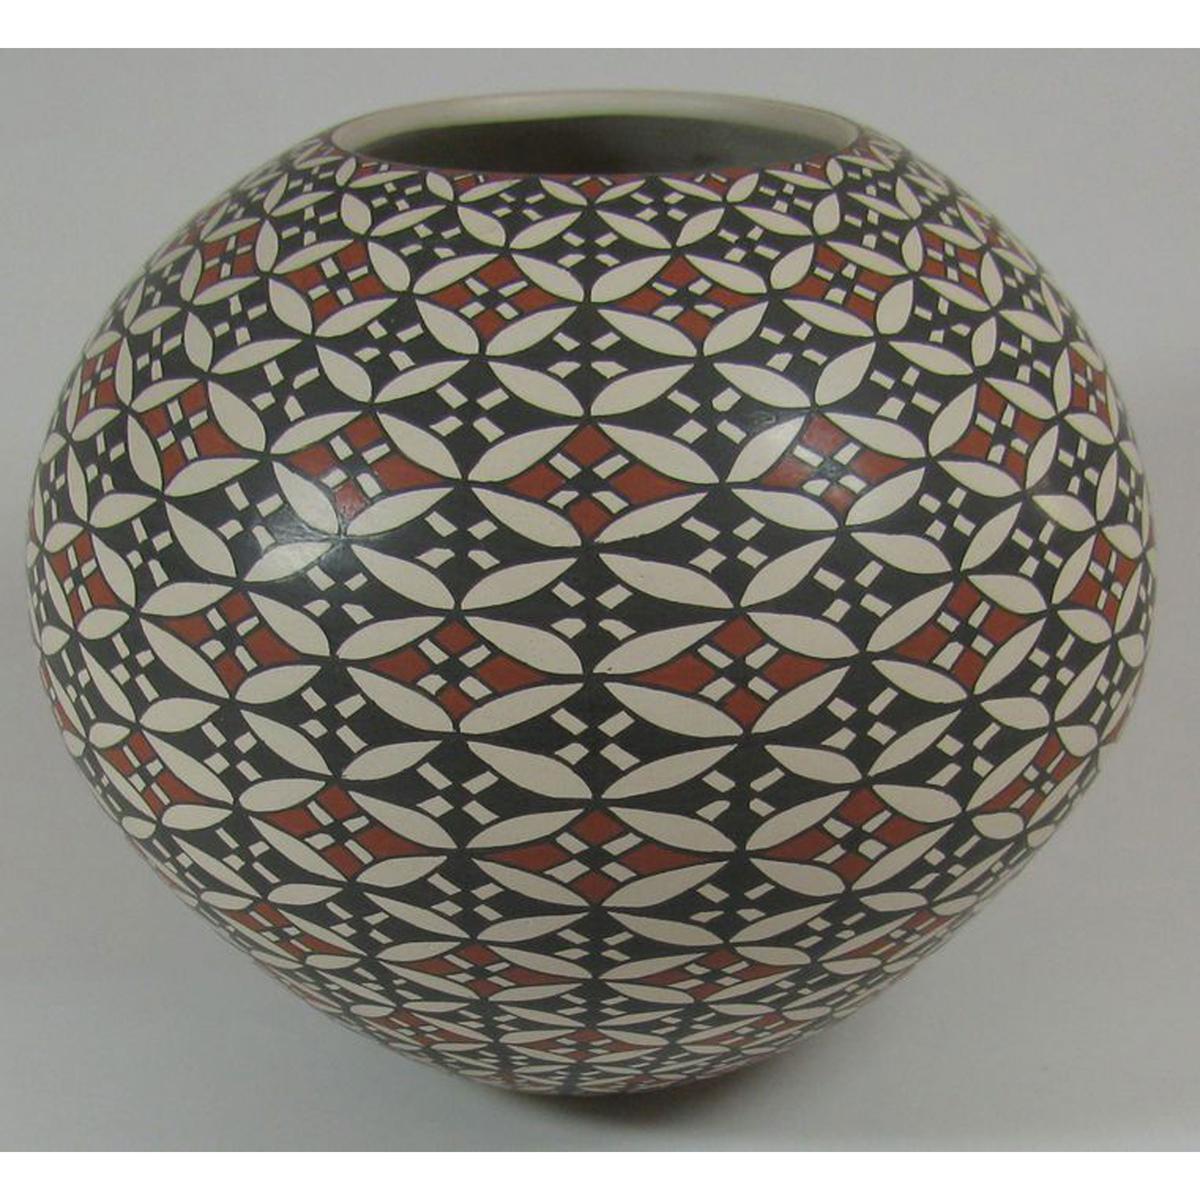 Mata Ortiz Pottery by Rosa Loya